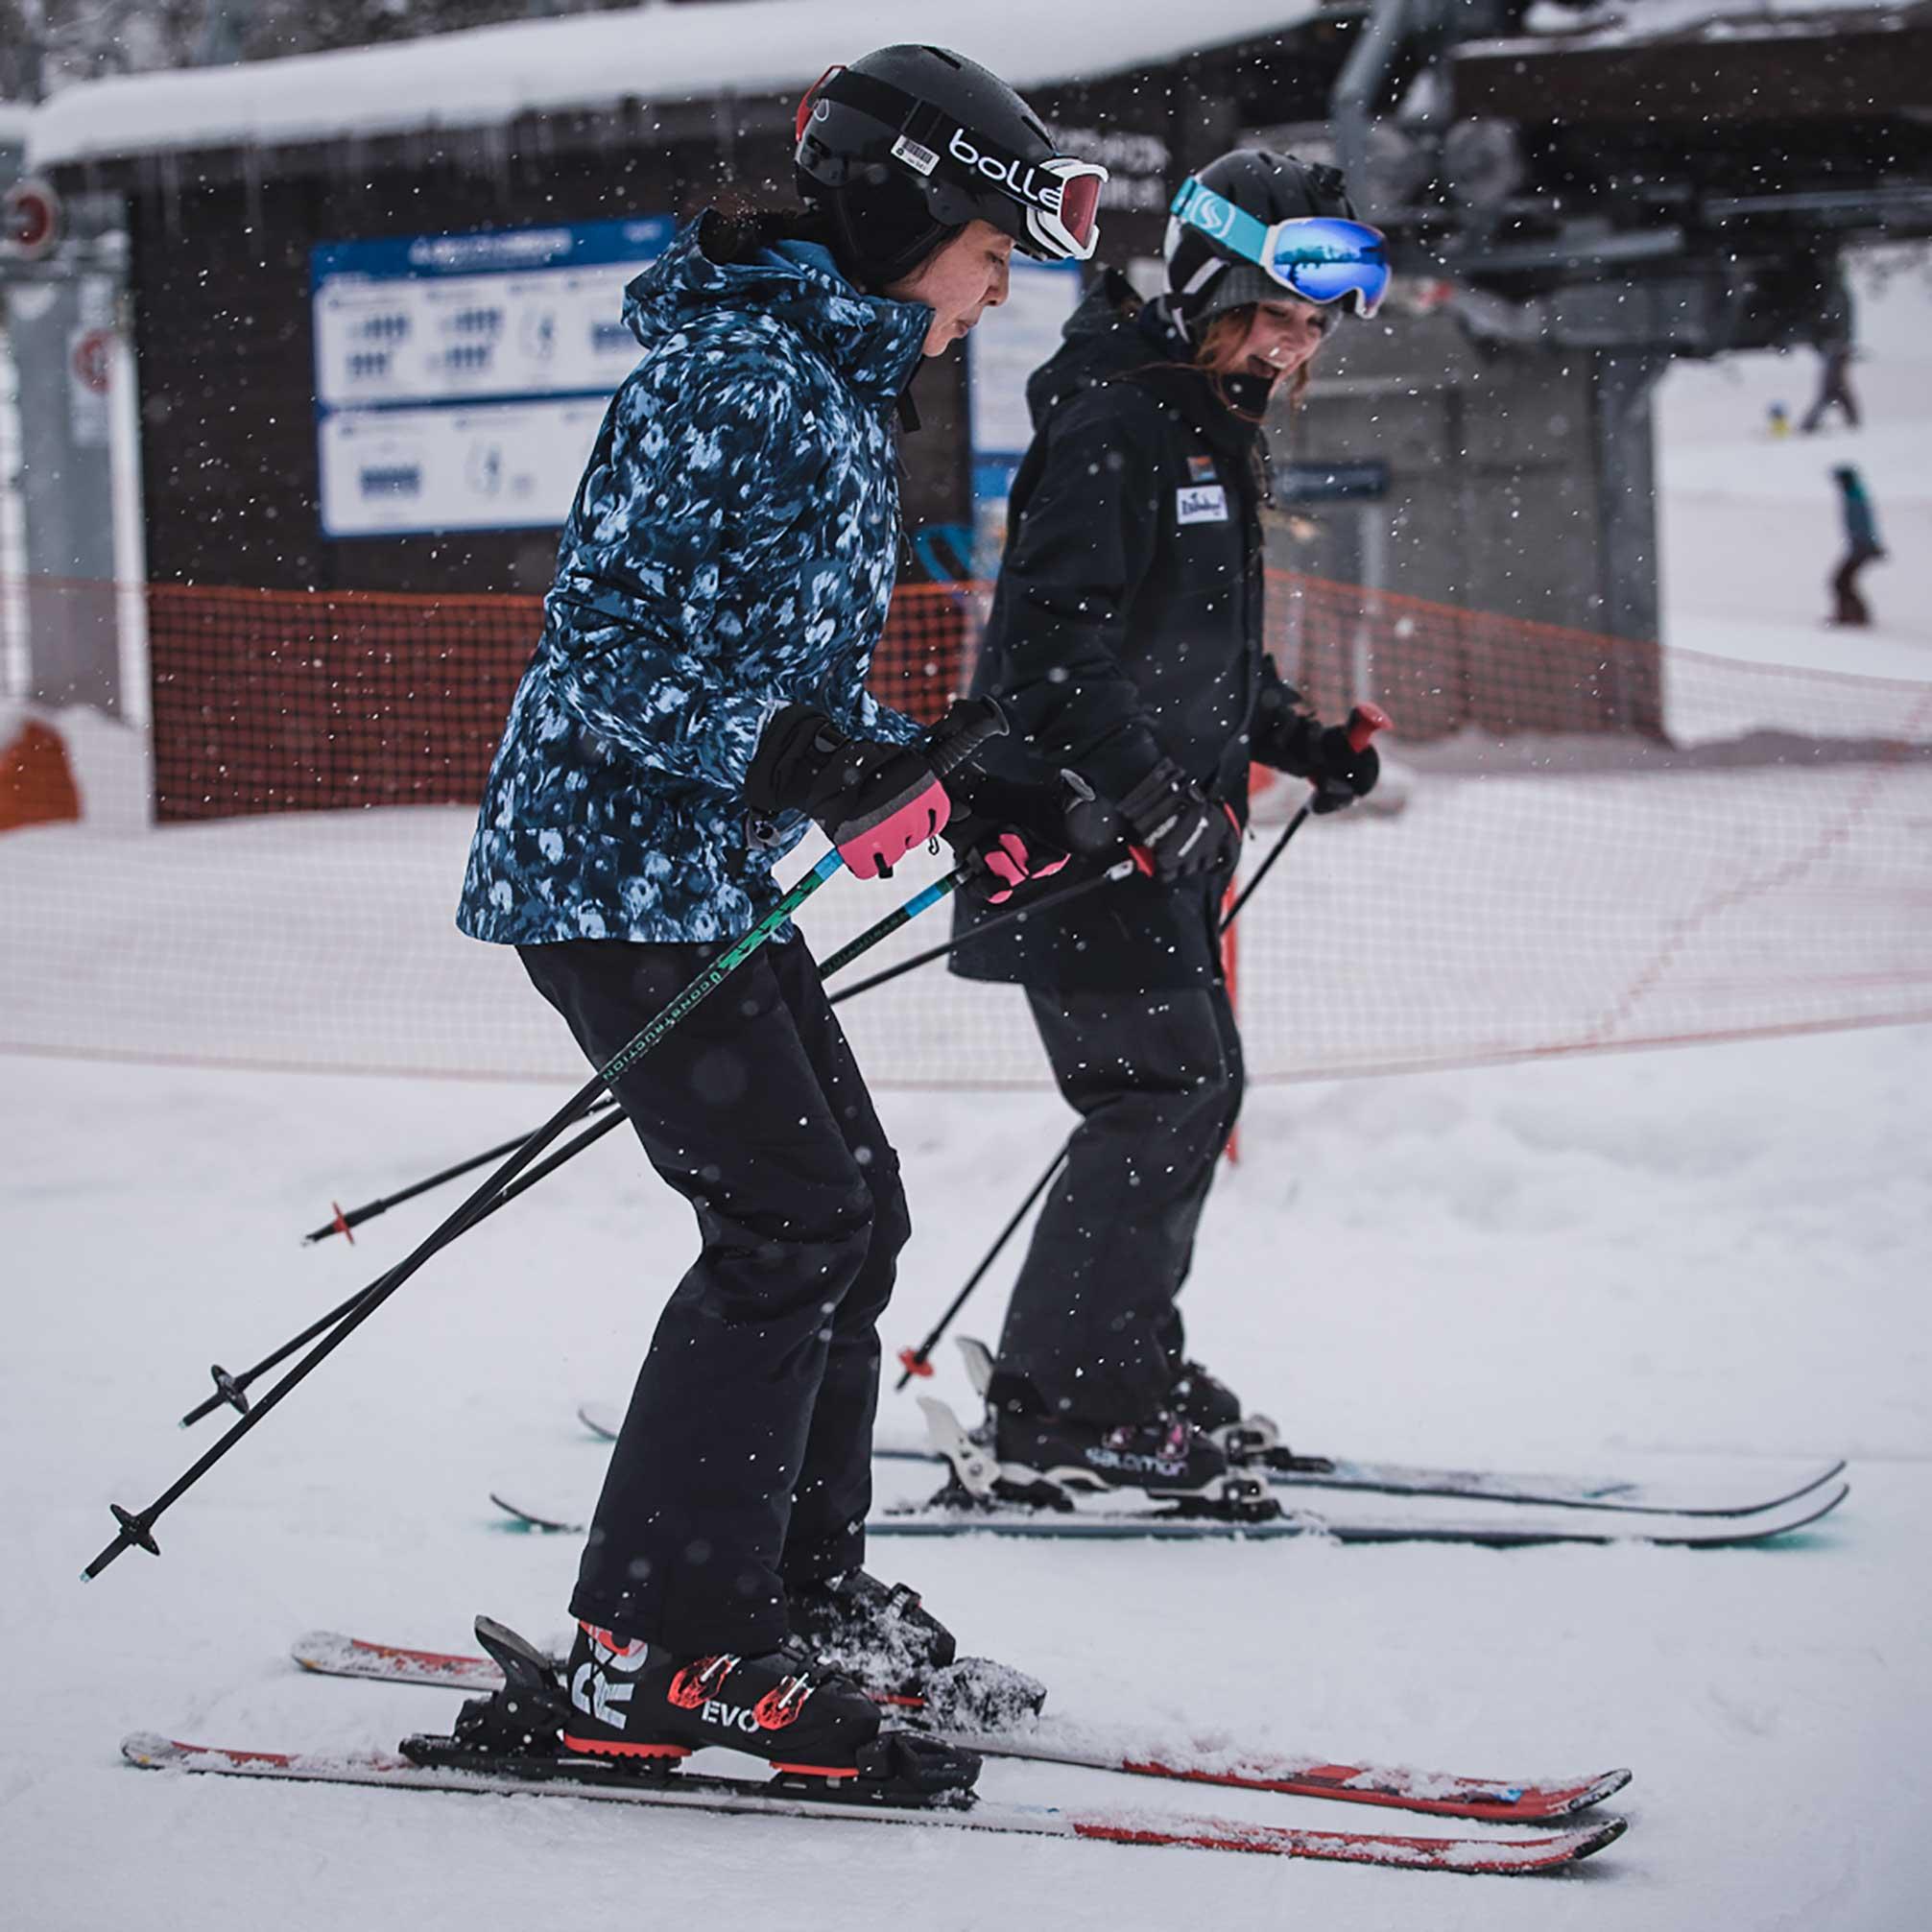 Full Day Private Ski Lesson